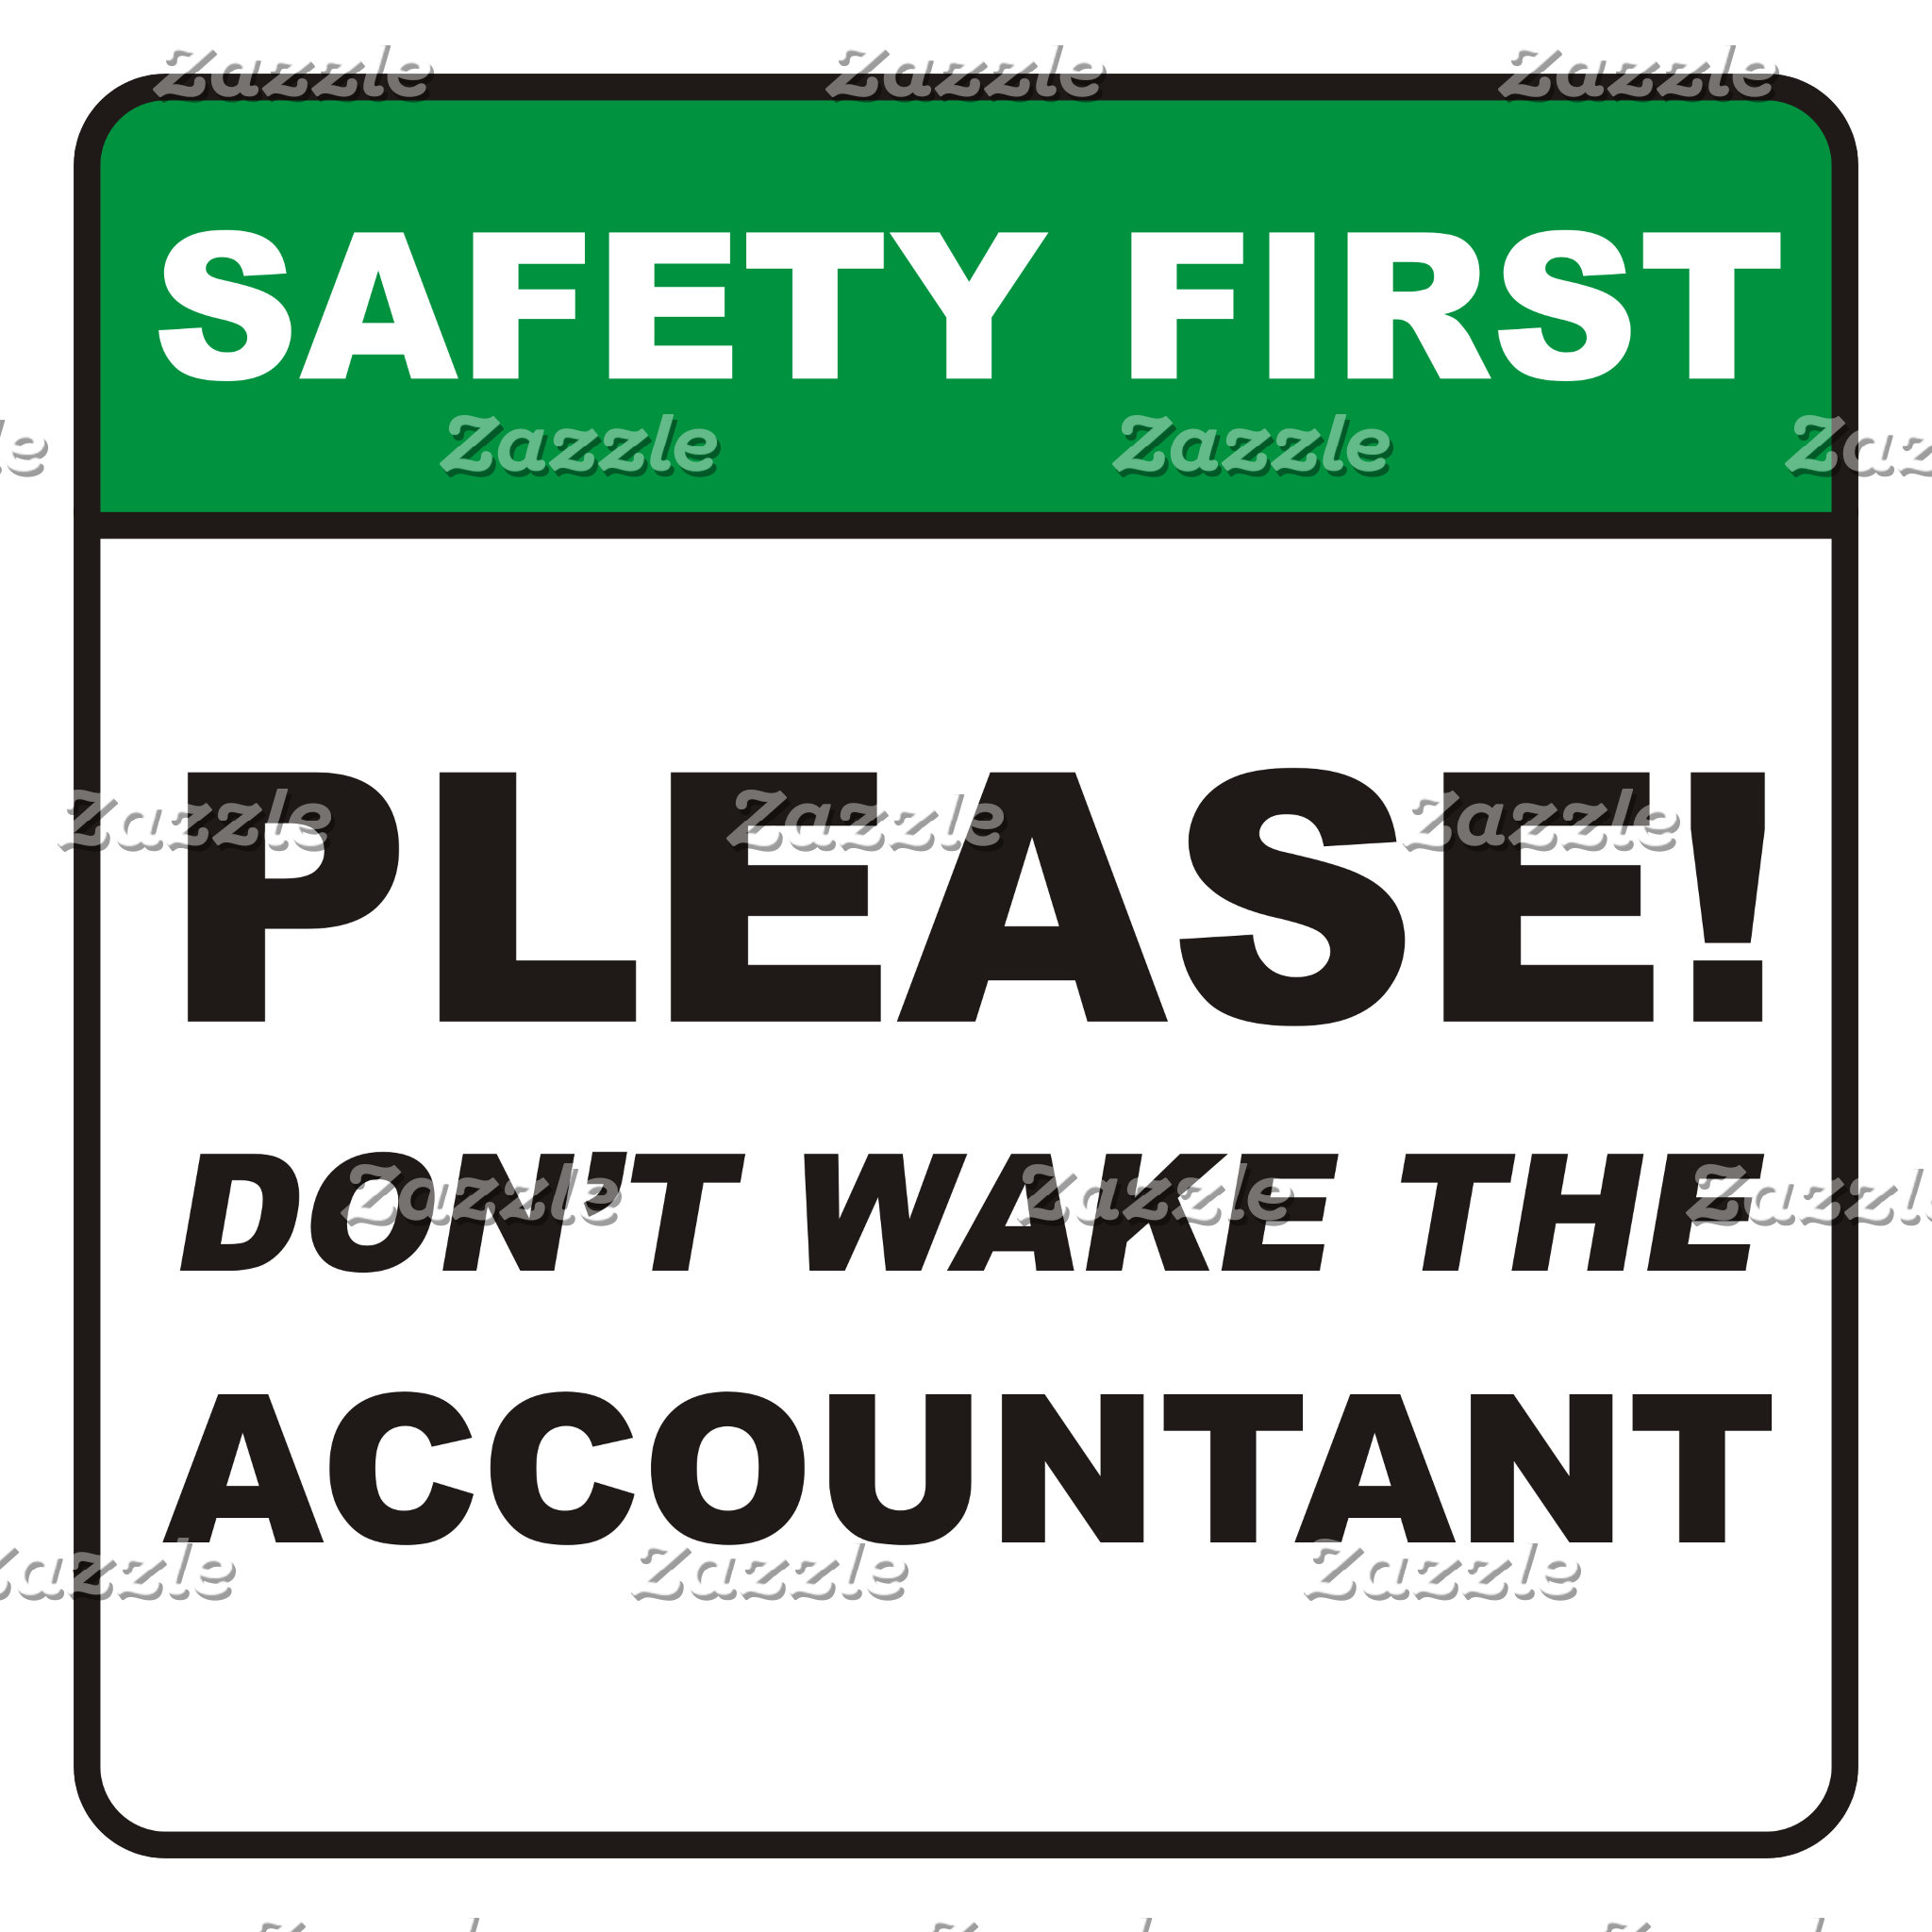 Accountant / Wake